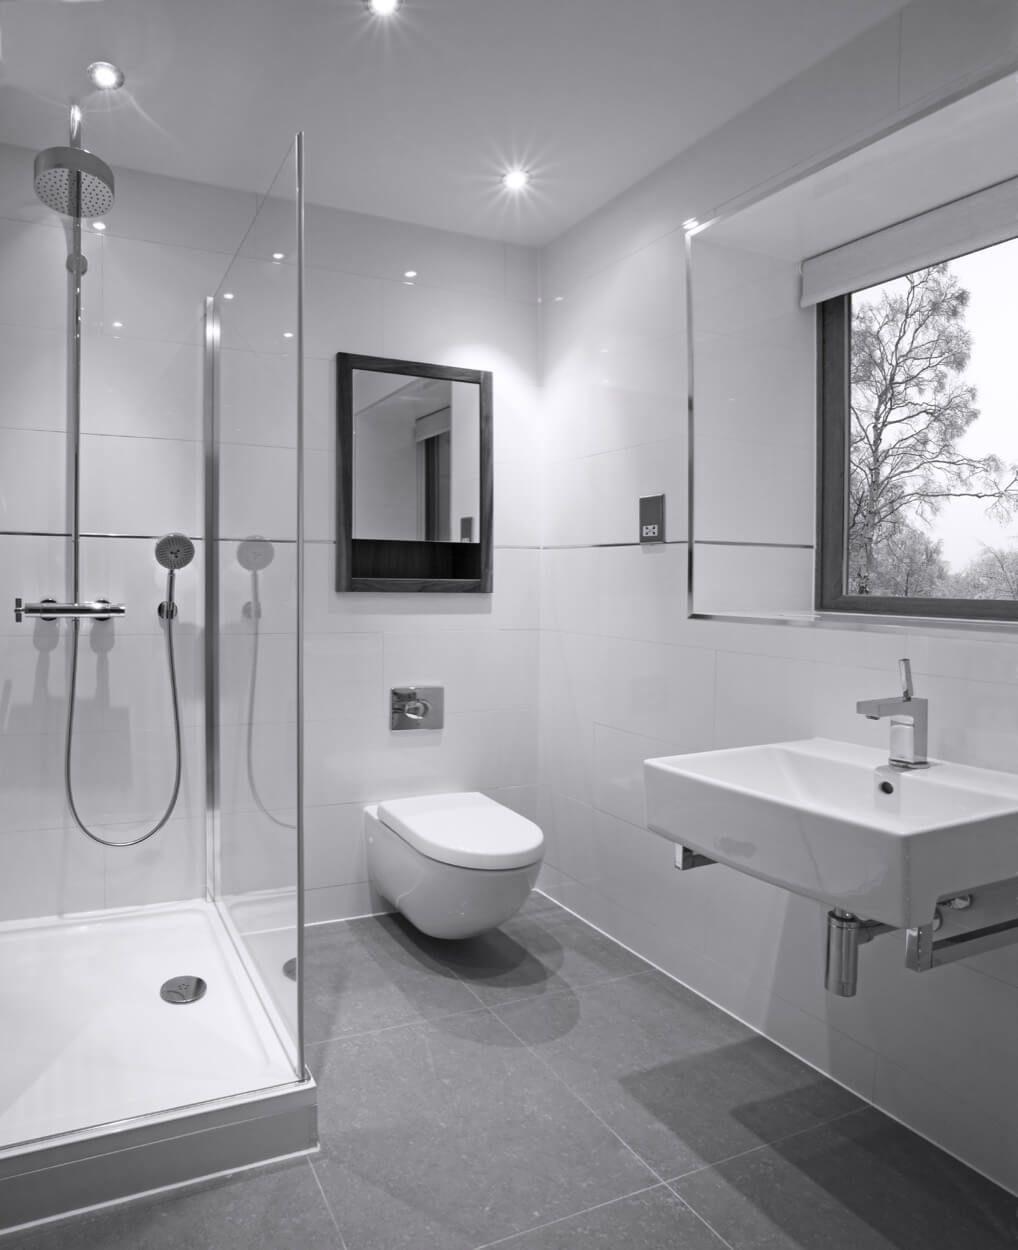 Wall Mounted White Sink Below Large Mirror | Bathroom Ideas ...